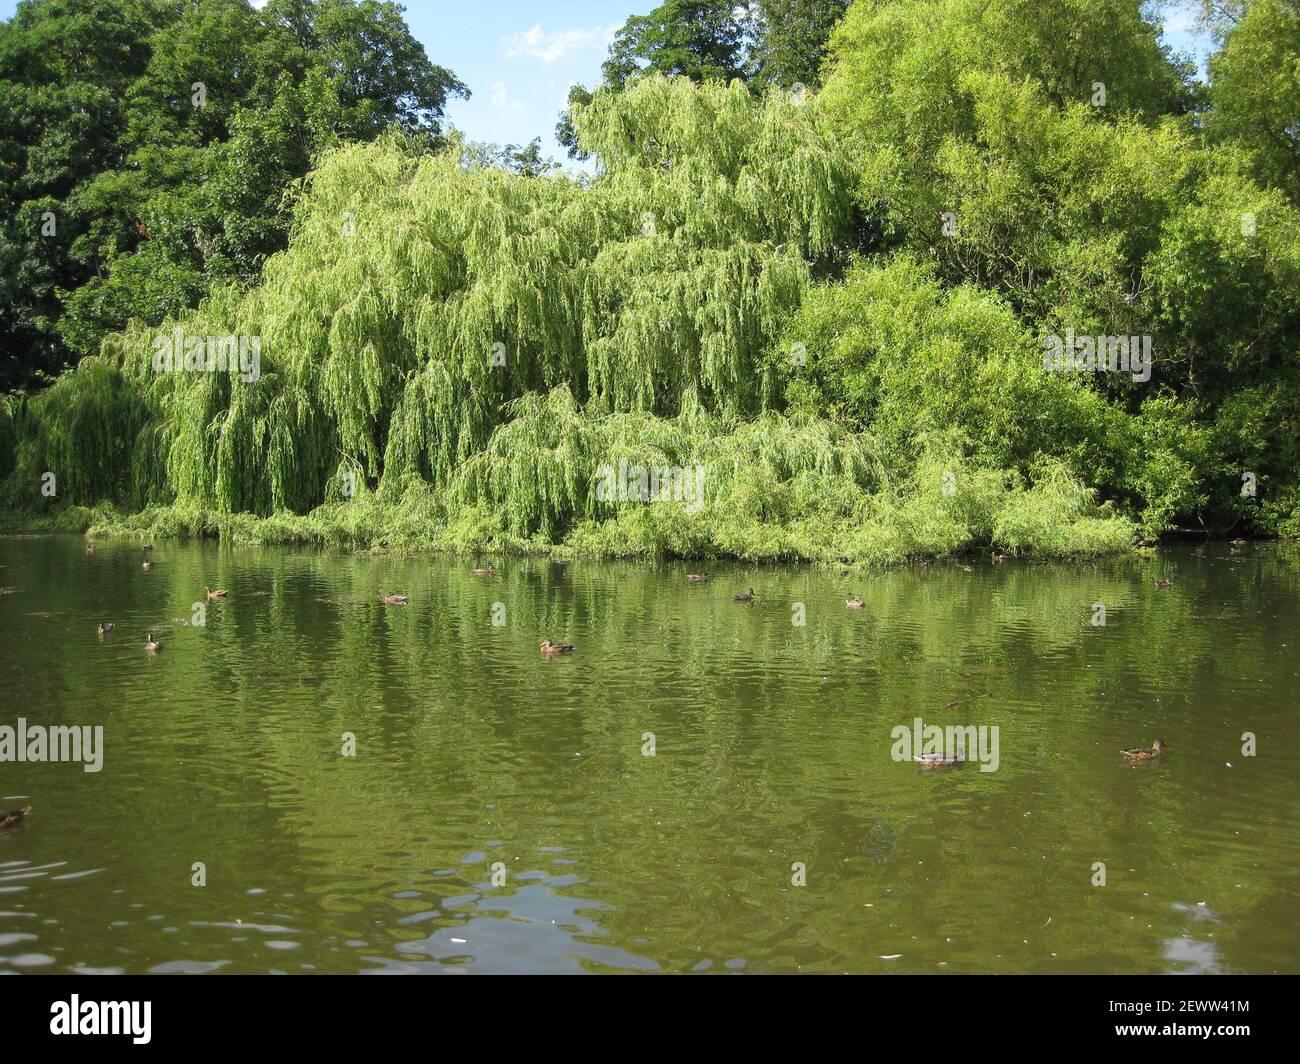 Thwaite Hall Gardens lake views in Cottingham, East Yorkshire Stock Photo